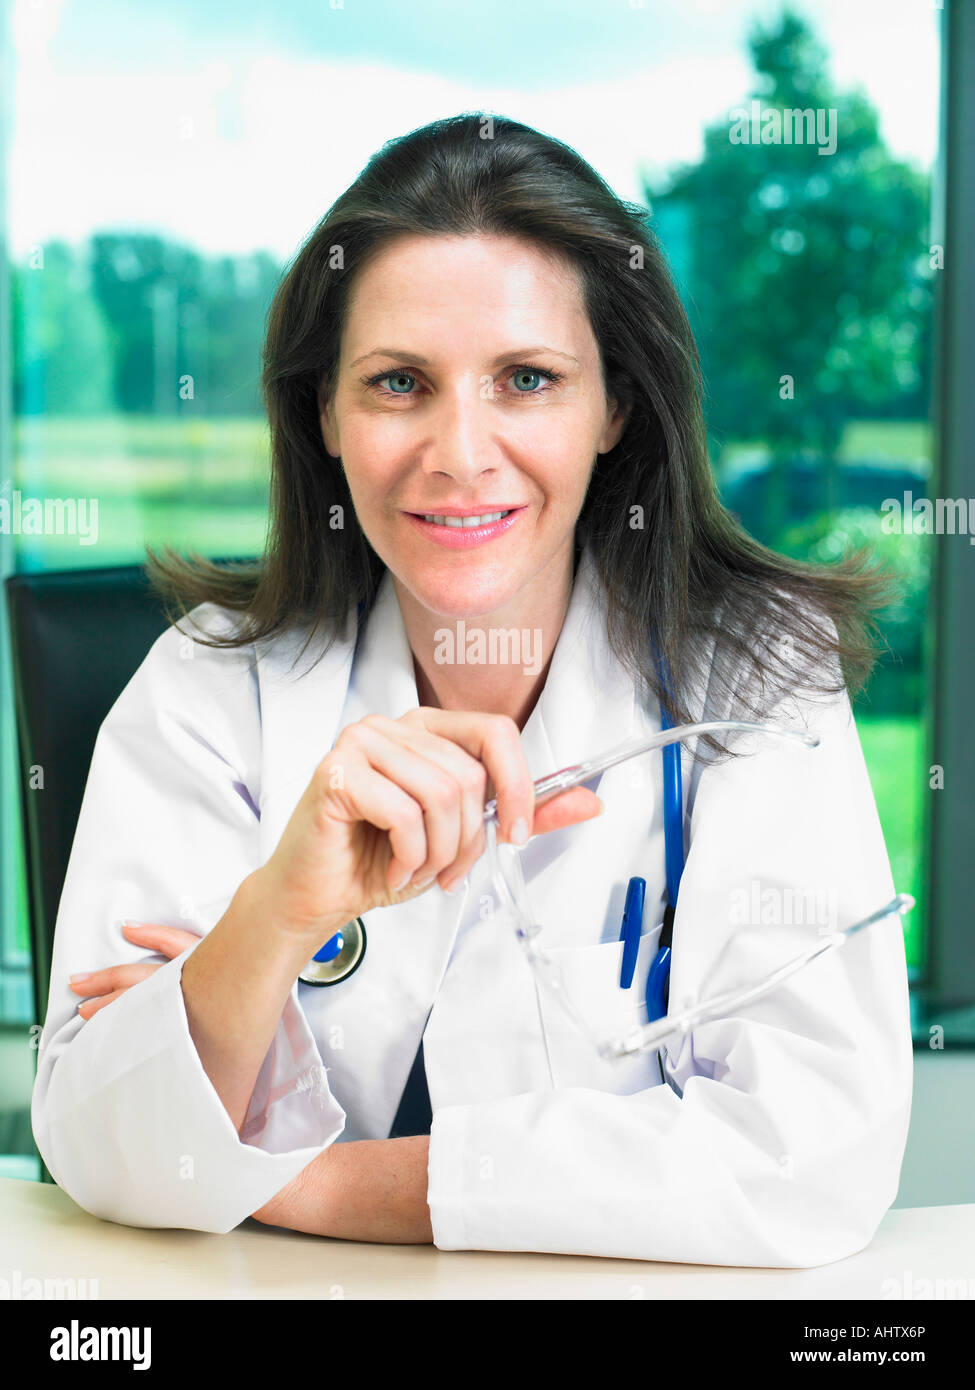 Portrait of female doctor. - Stock Image